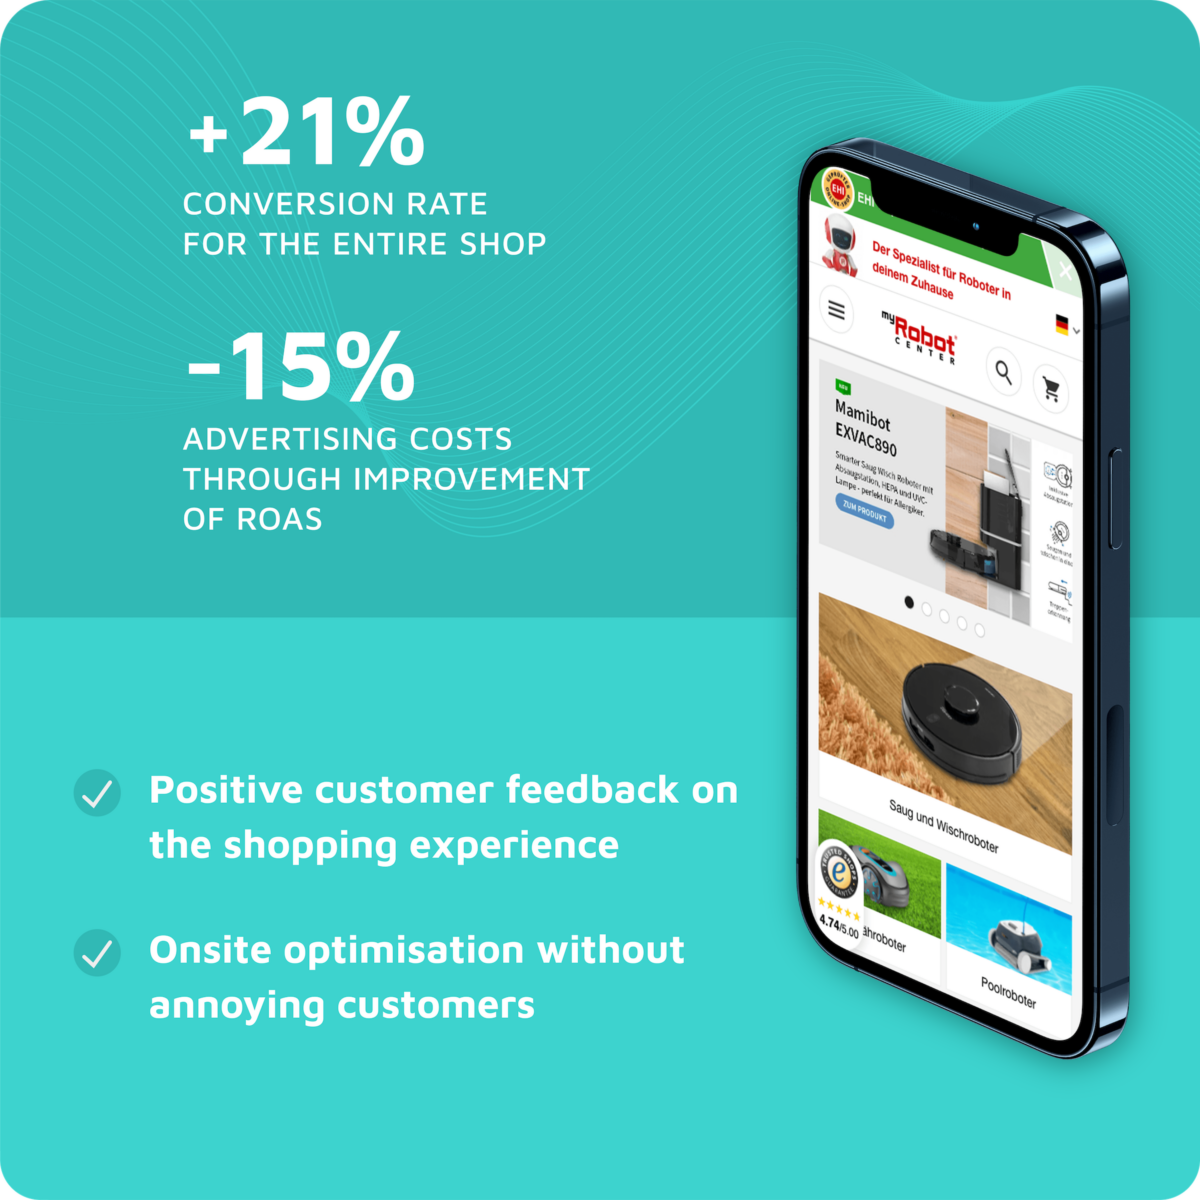 MyRobotCenter Onlineshop reduces Shopping Cart Abandonment